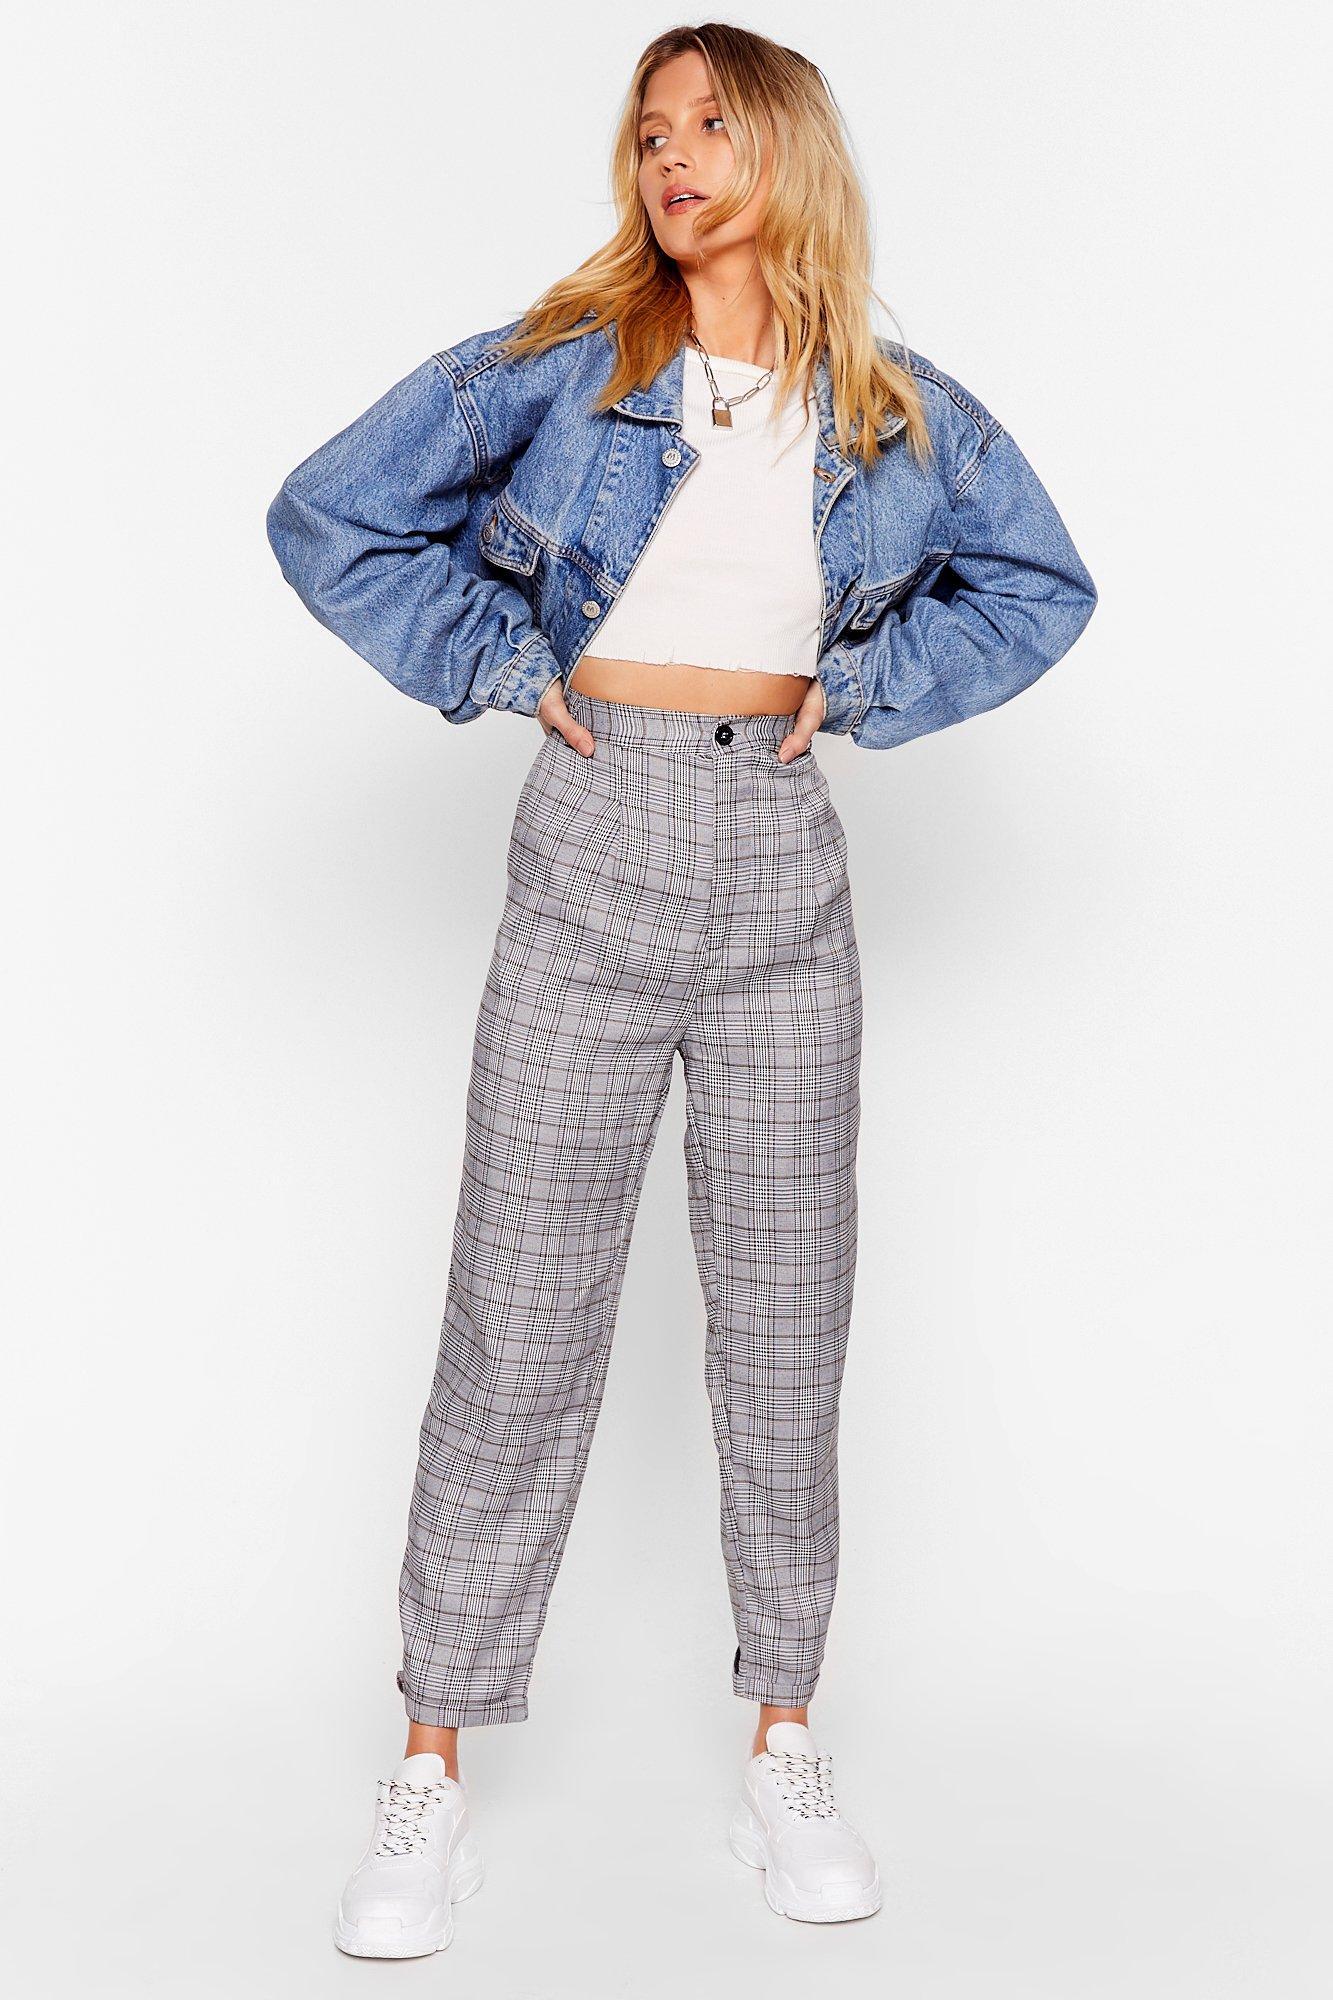 Image of Checkin' Up on You High-Waisted Pants